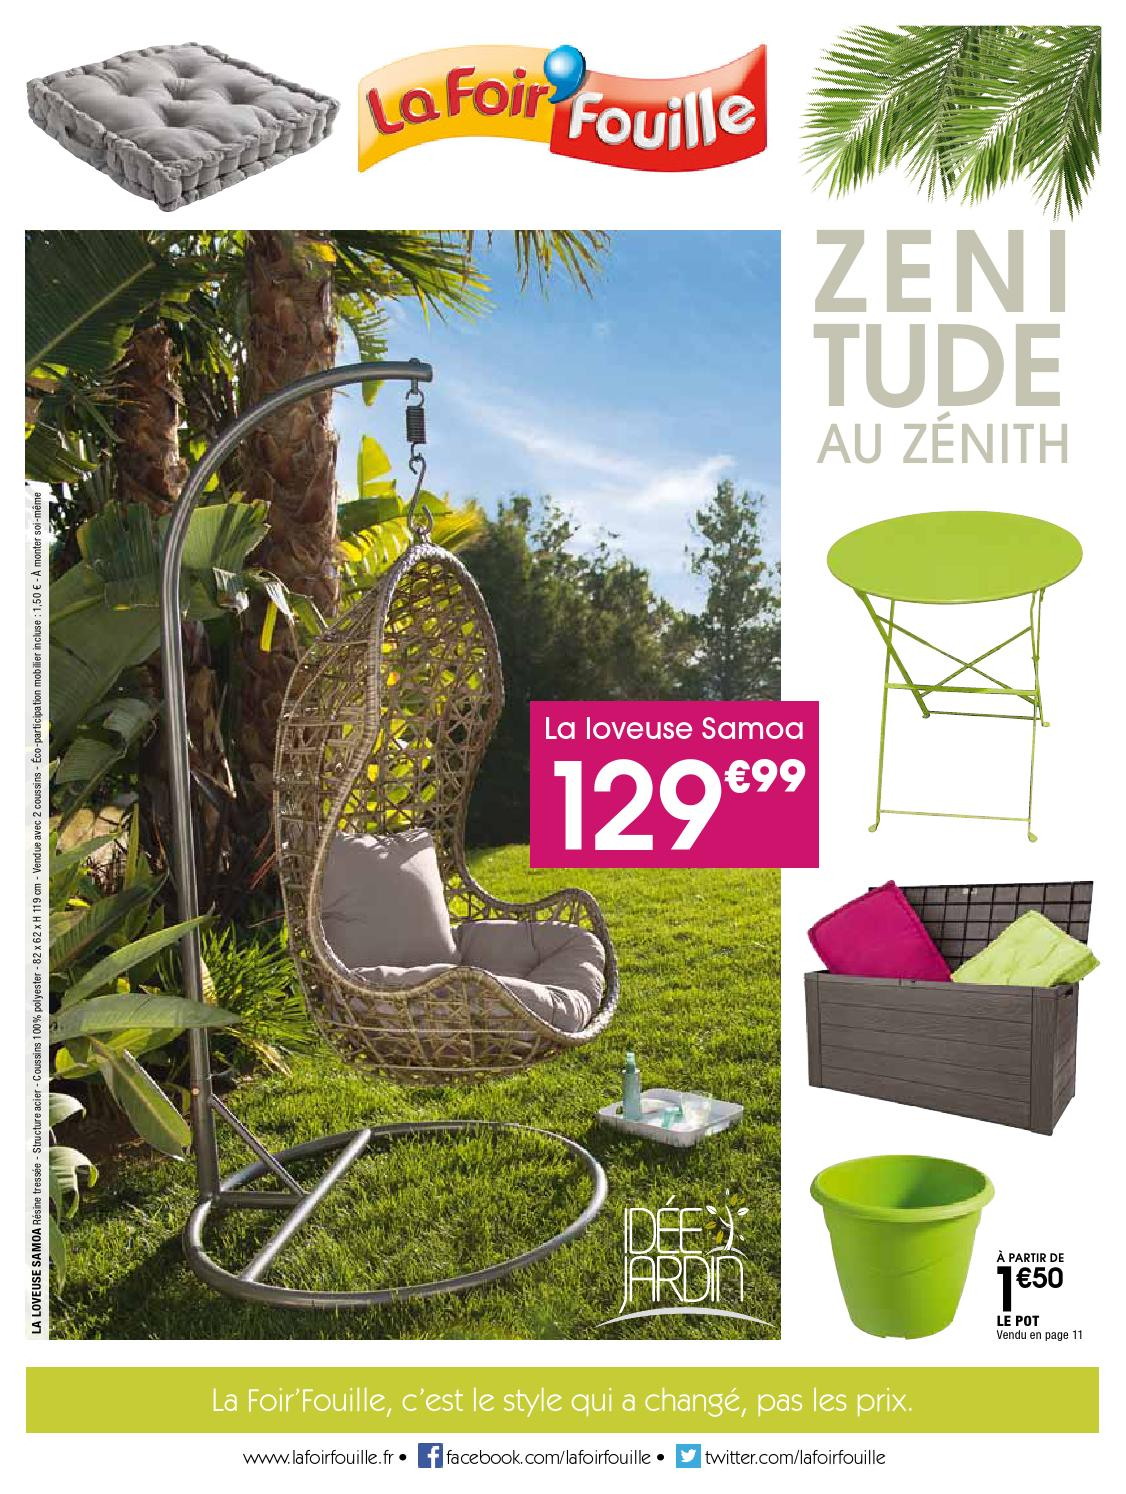 Catalogue La Foir Fouille - Zenitude Au Zénith By Joe Monroe ... destiné Foir Fouille Salon De Jardin